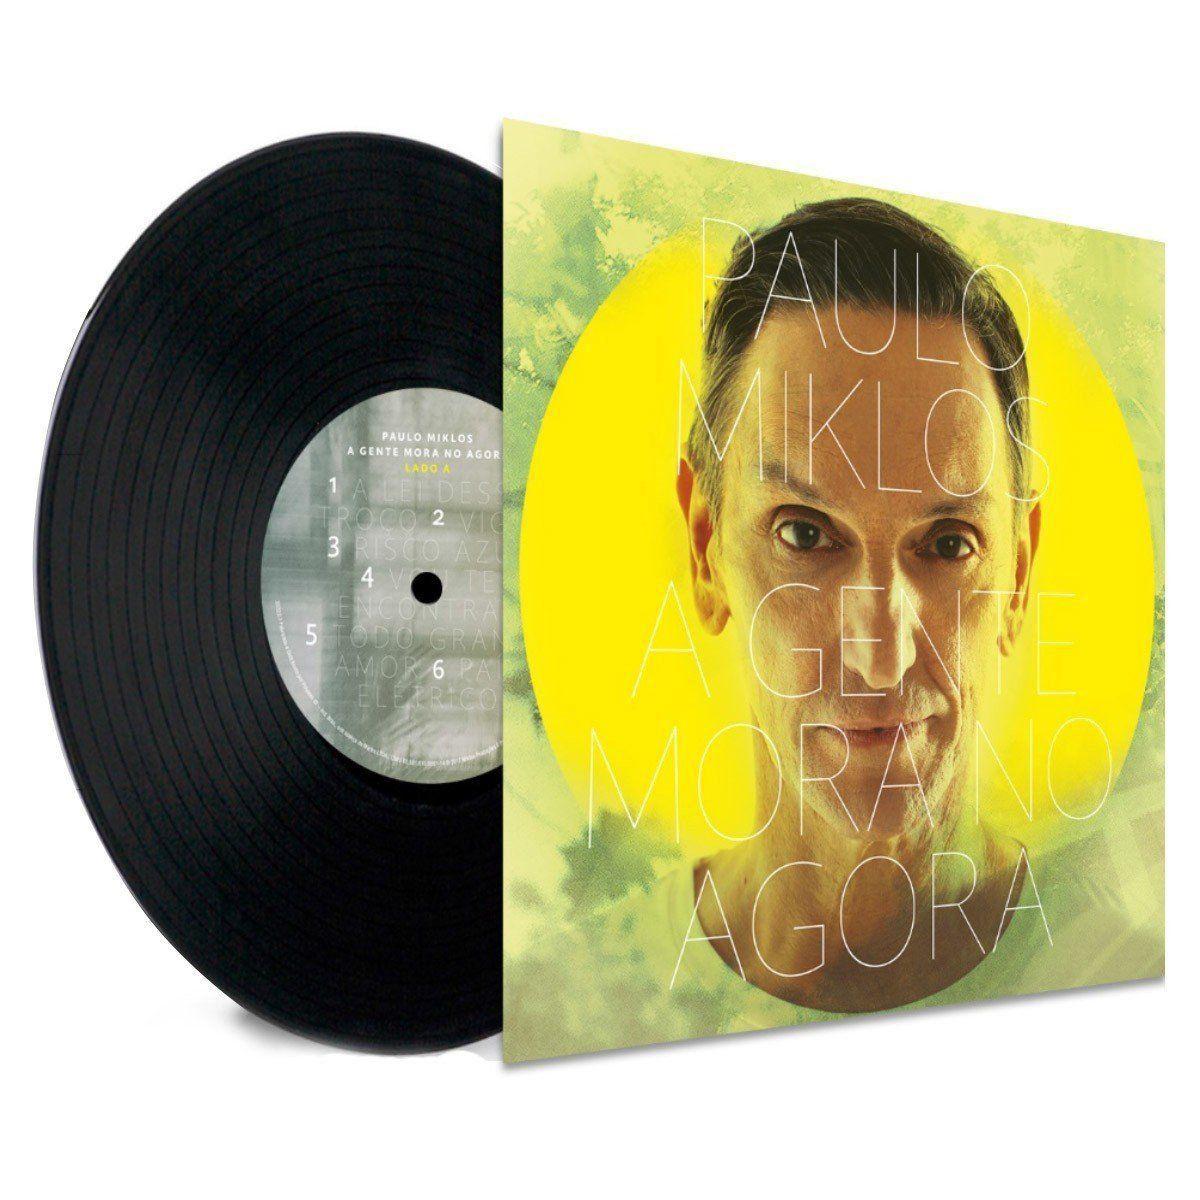 Vinil LP Paulo Miklos A Gente Mora no Agora  - bandUP Store Marketplace